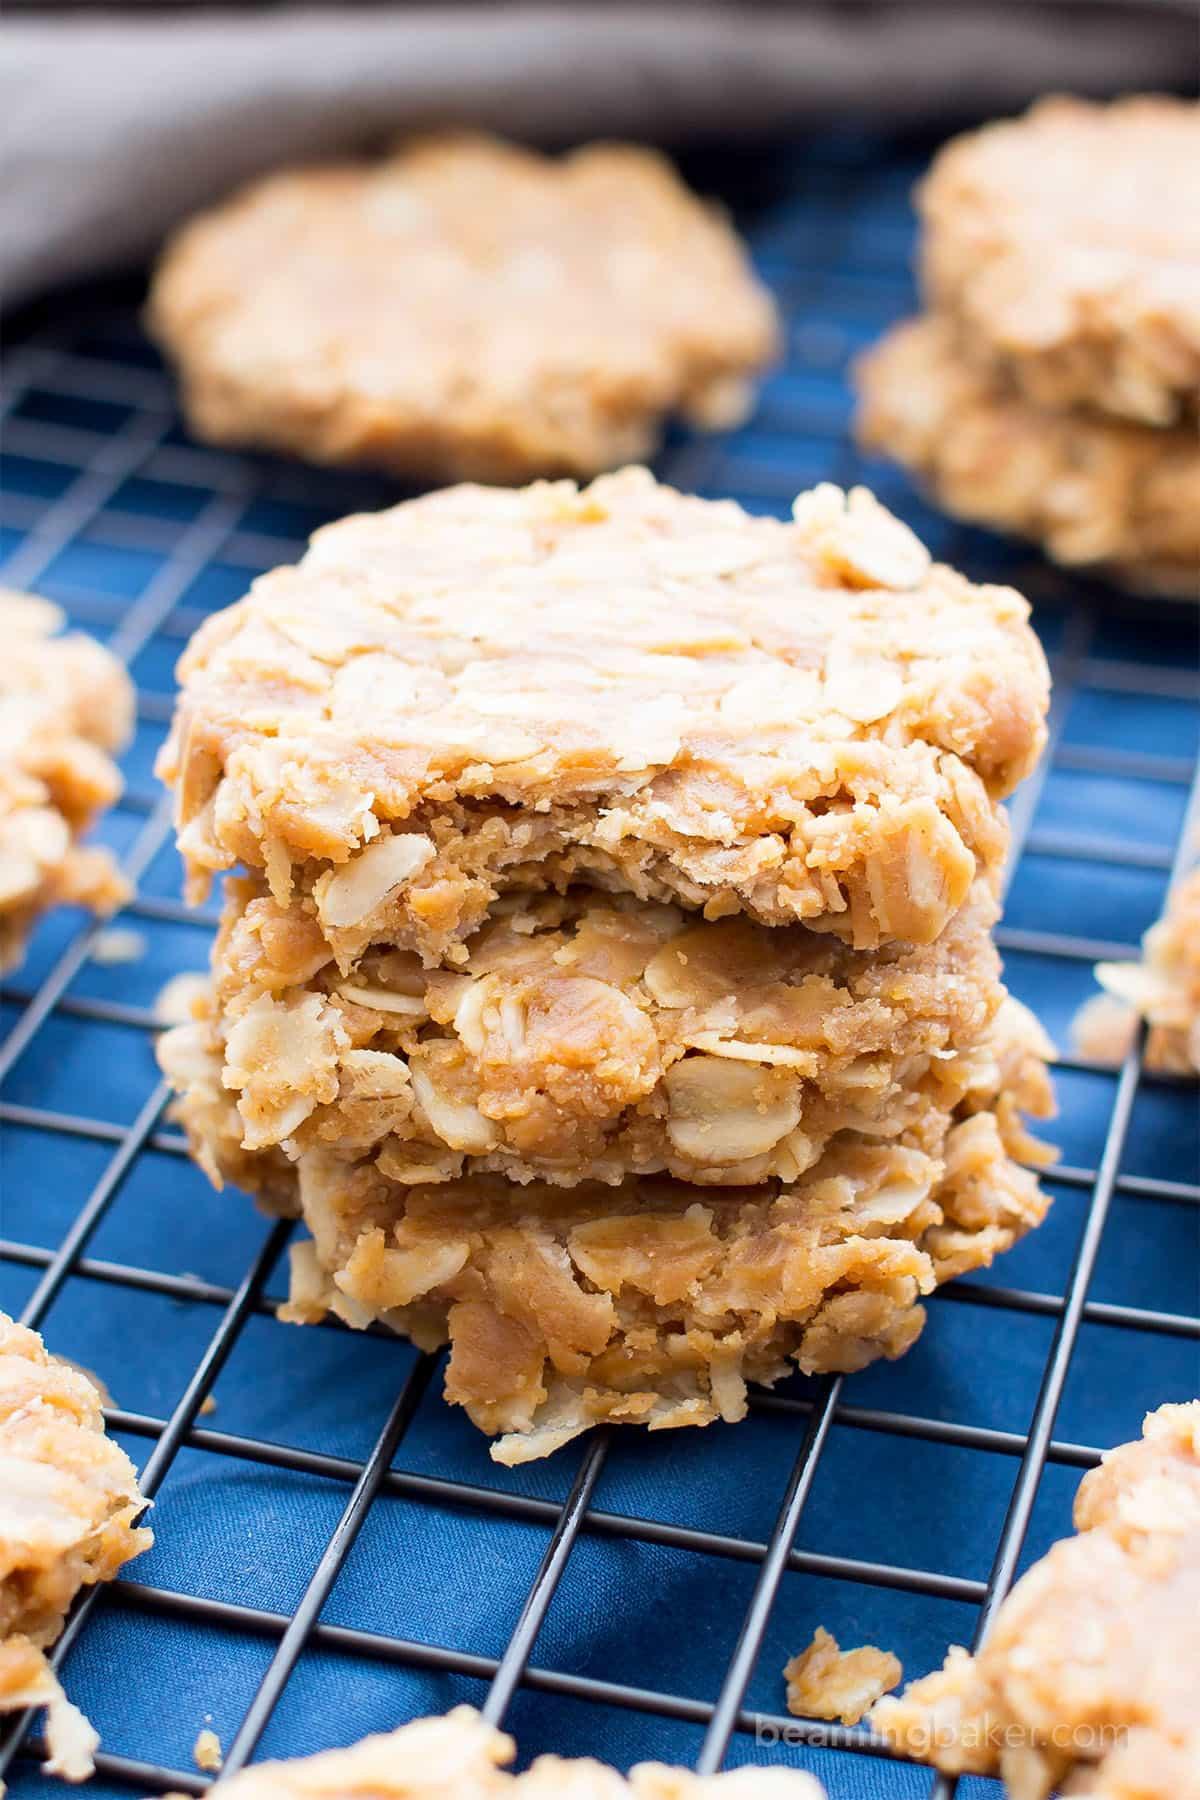 No Bake Peanut Butter Oatmeal Cookies  3 Ingre nt No Bake Peanut Butter Oatmeal Cookies Gluten